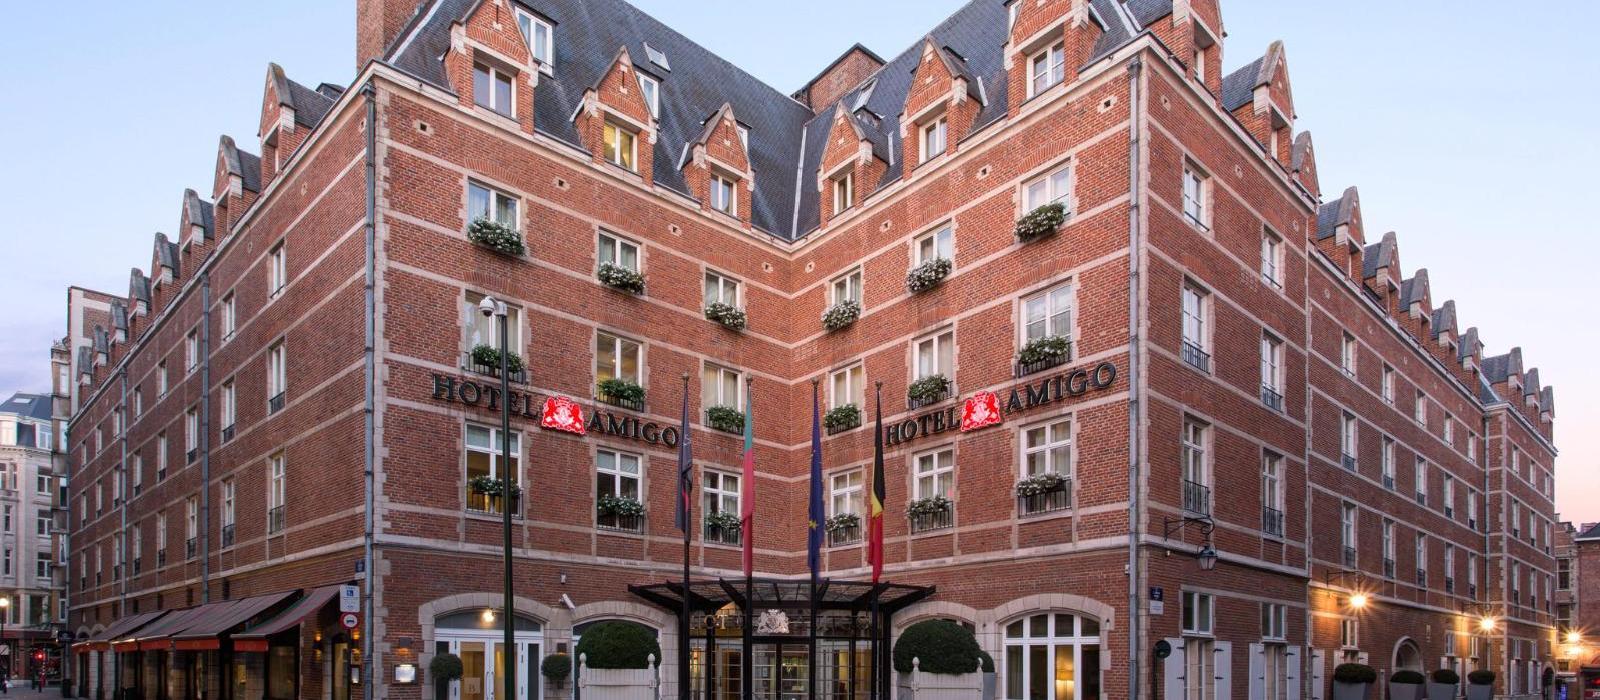 洛克福特阿米戈豪华酒店(Rocco Forte Hotel Amigo) 外观图片  www.lhw.cn